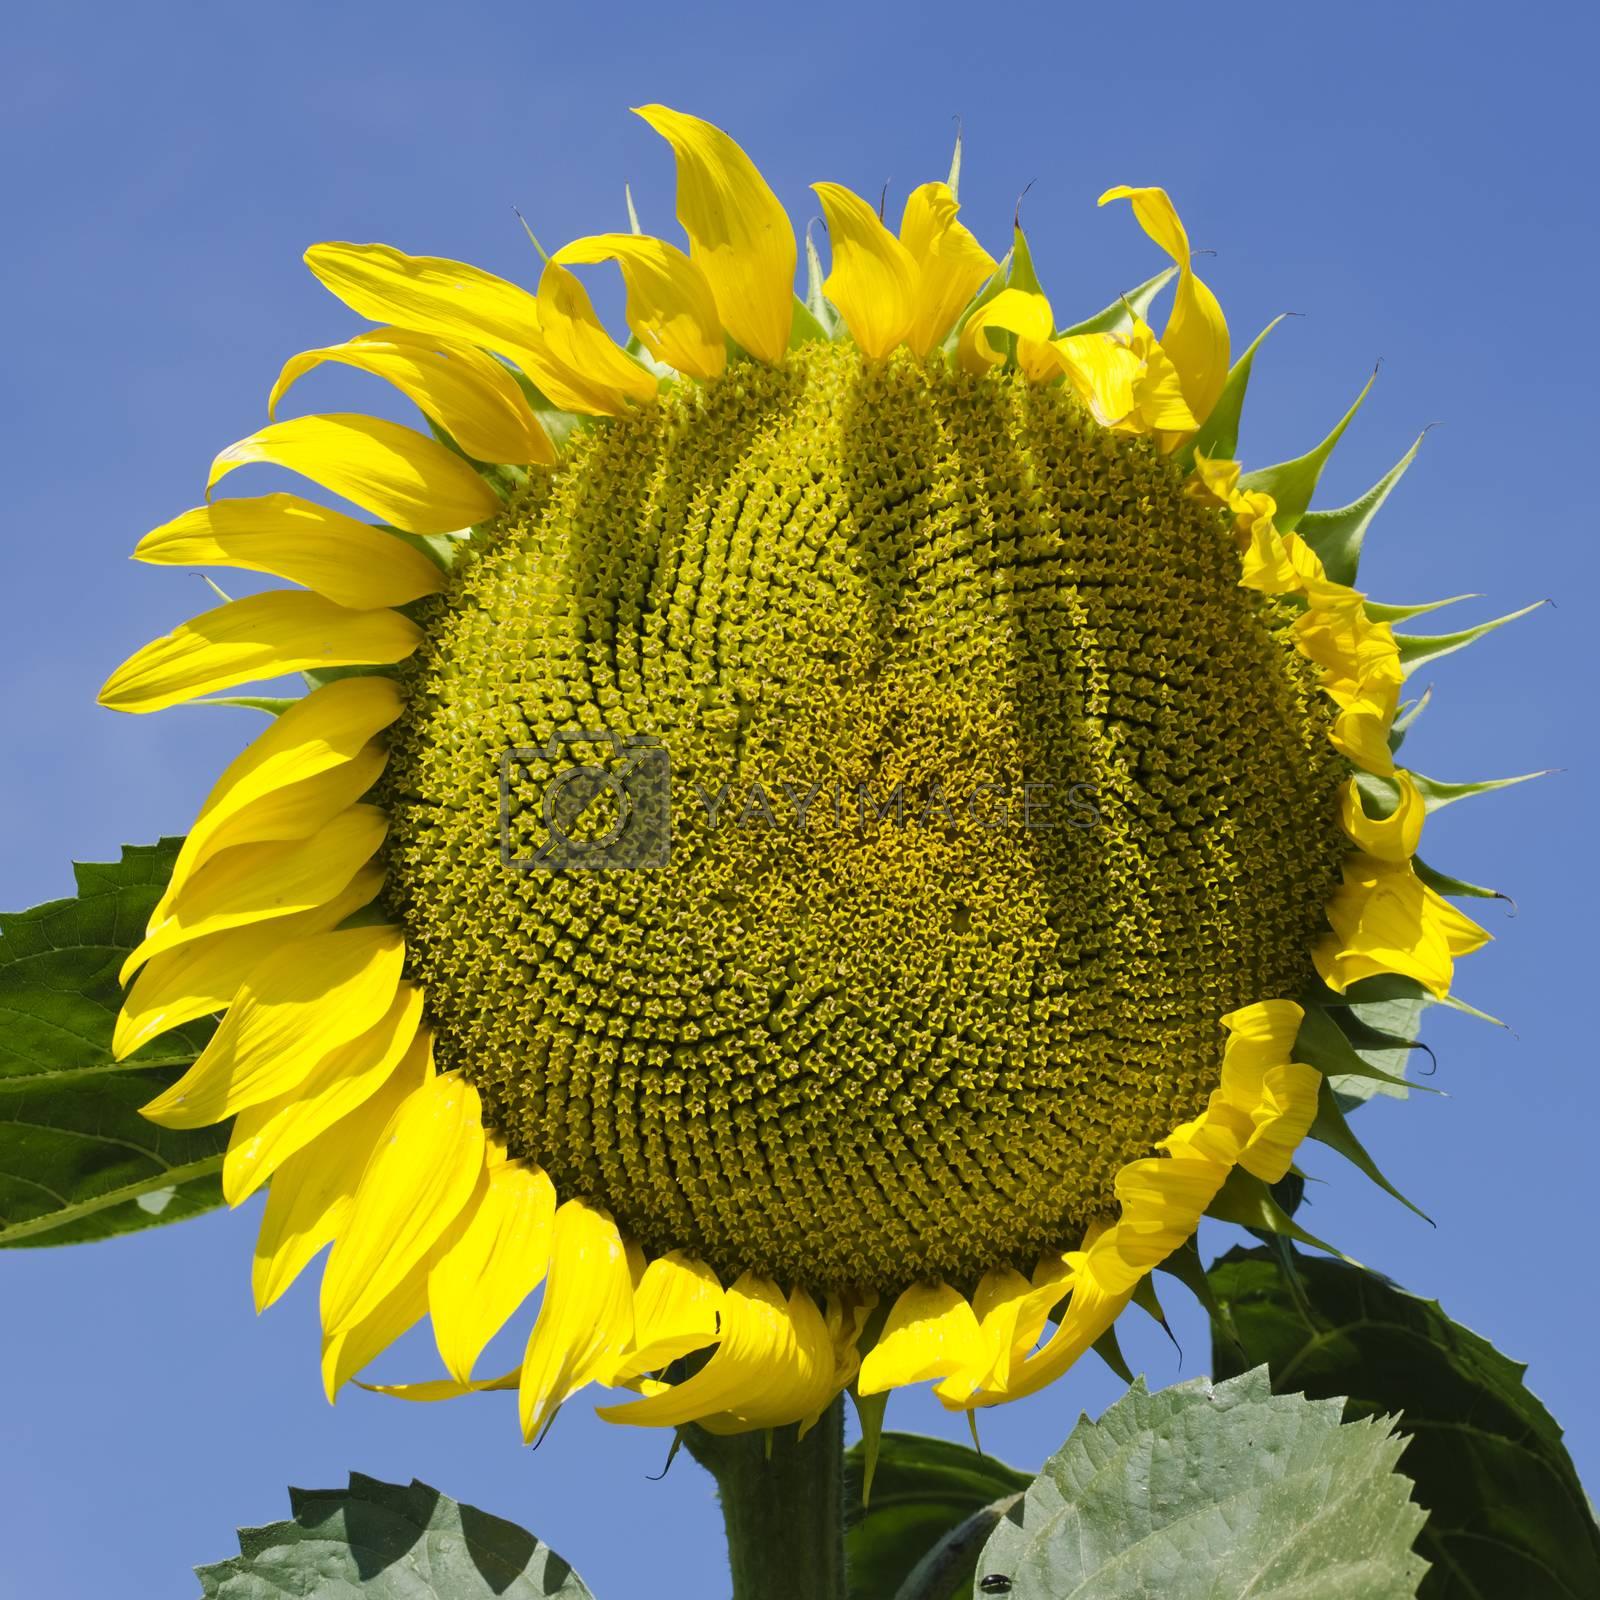 Yellow Sunflower in Summertime Over Sky Background